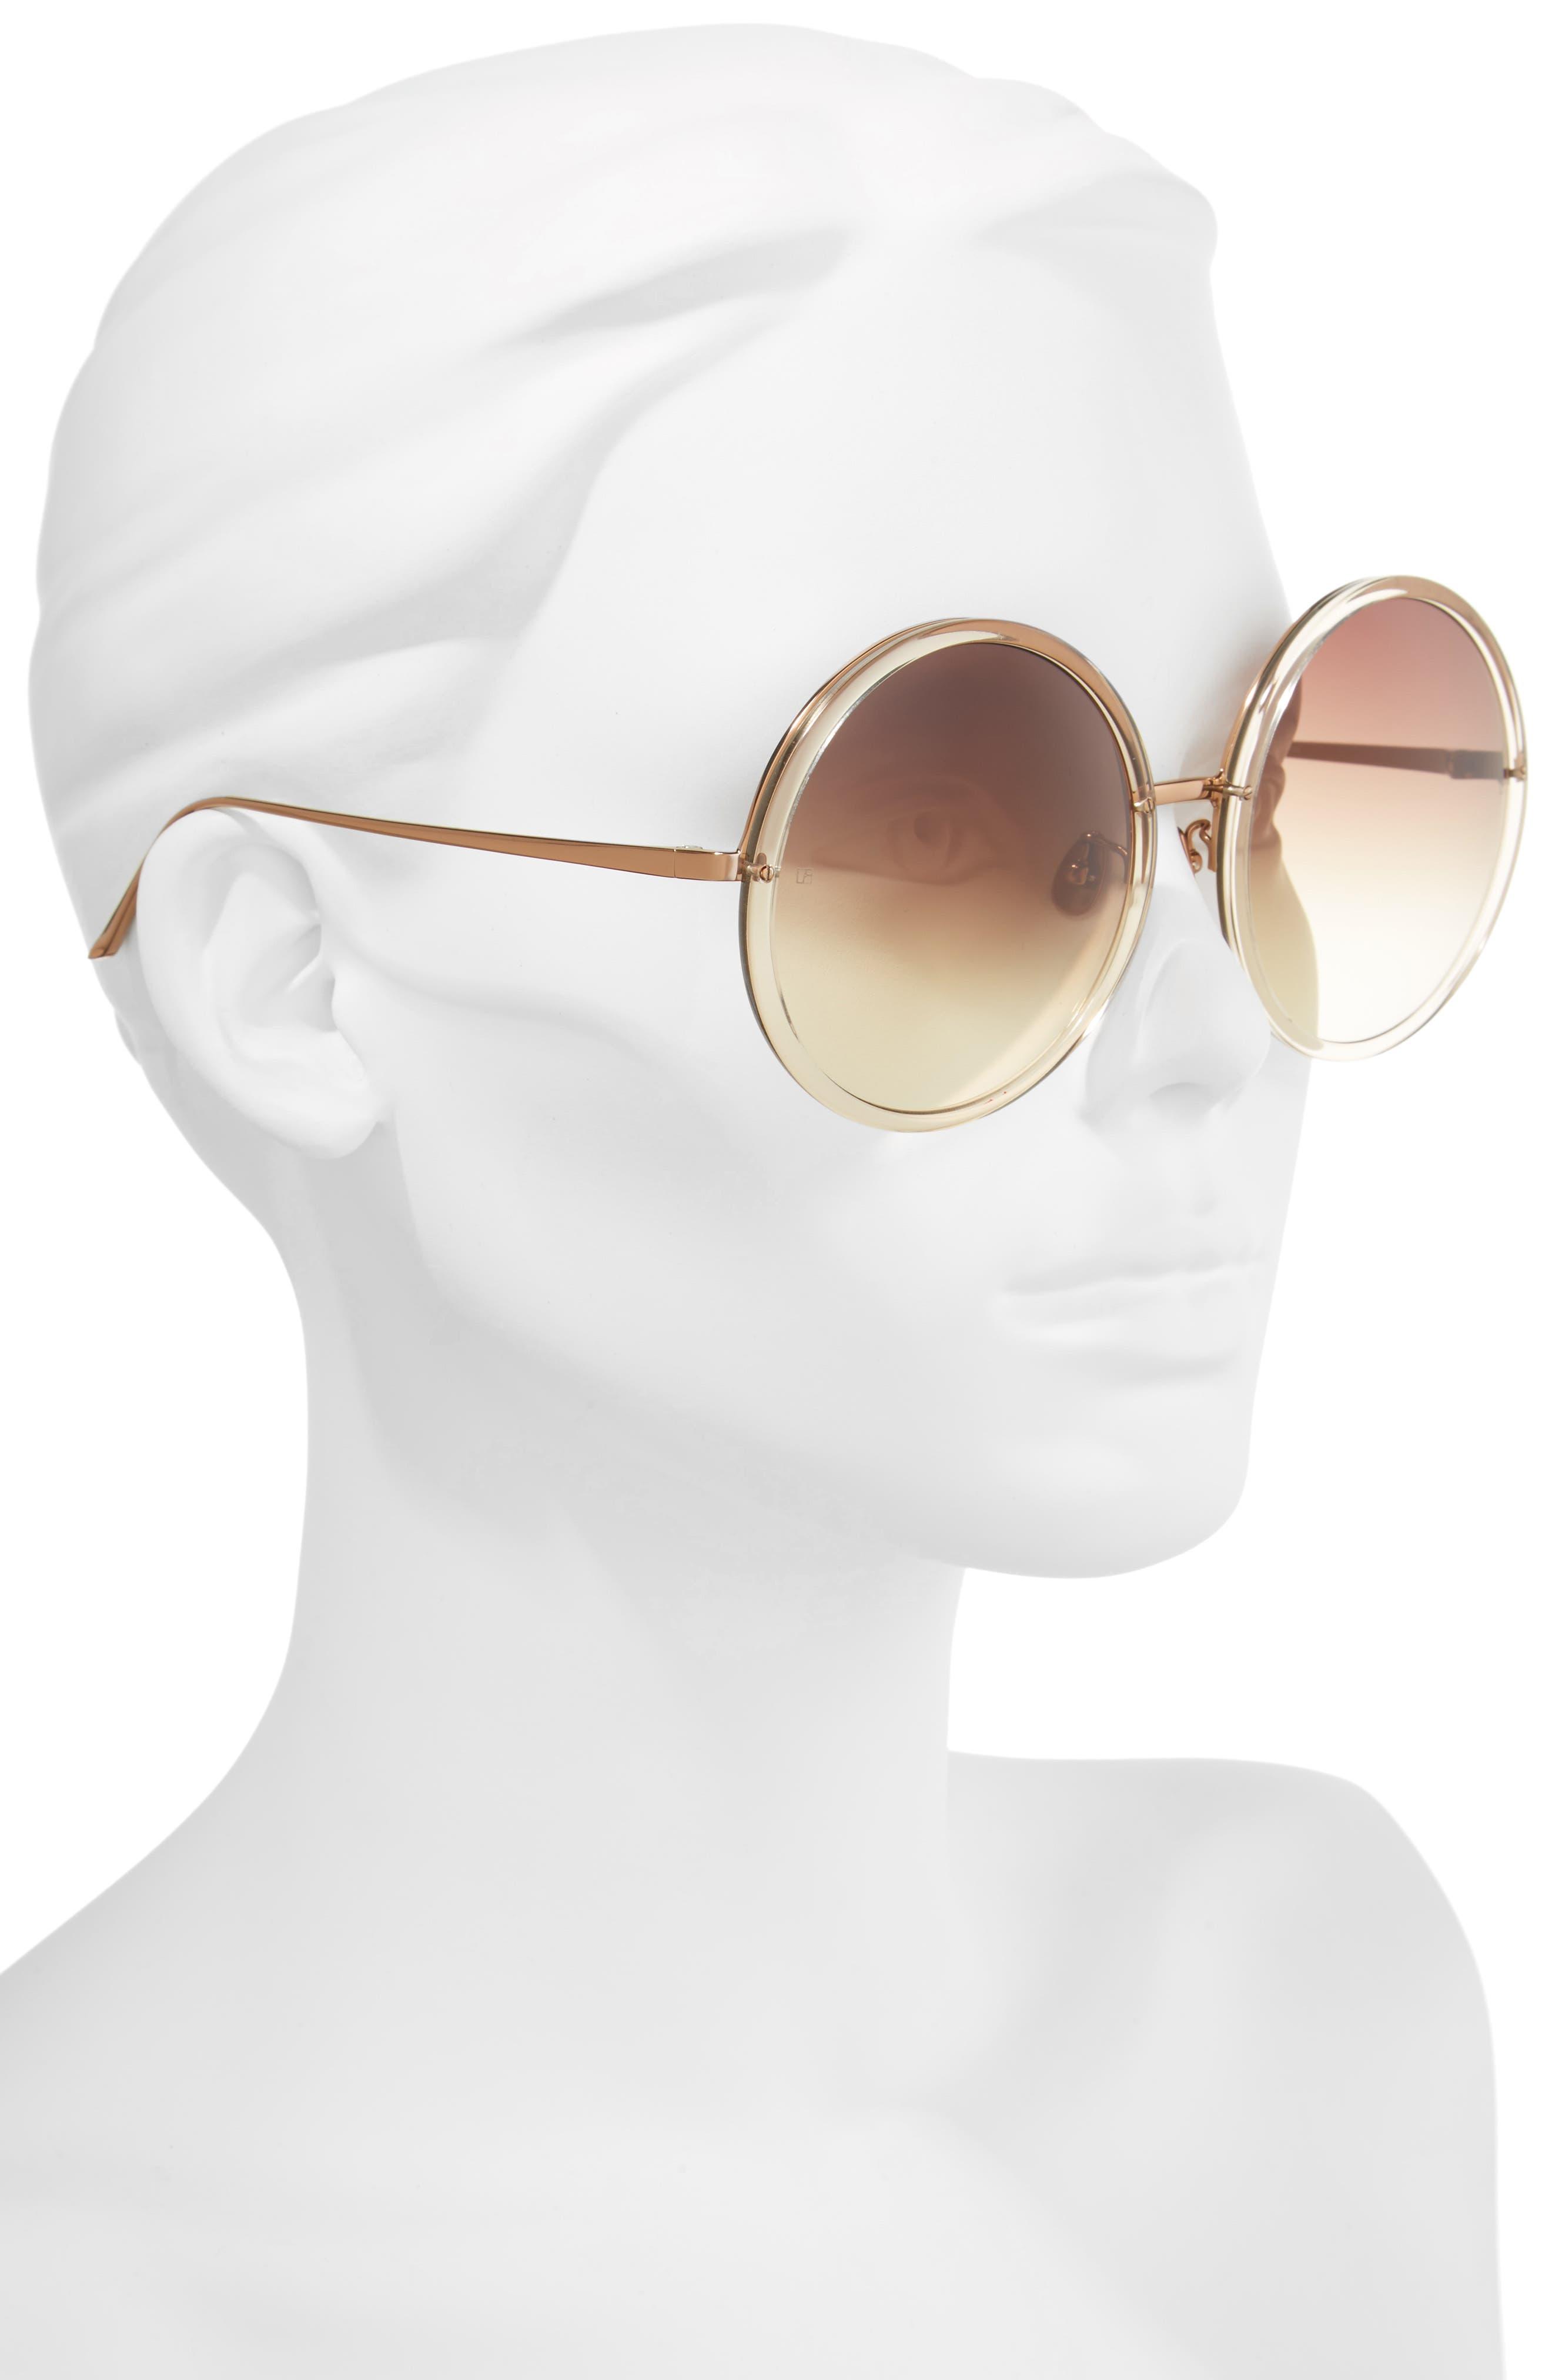 61mm Round 18 Karat Gold Trim Sunglasses,                             Alternate thumbnail 2, color,                             020